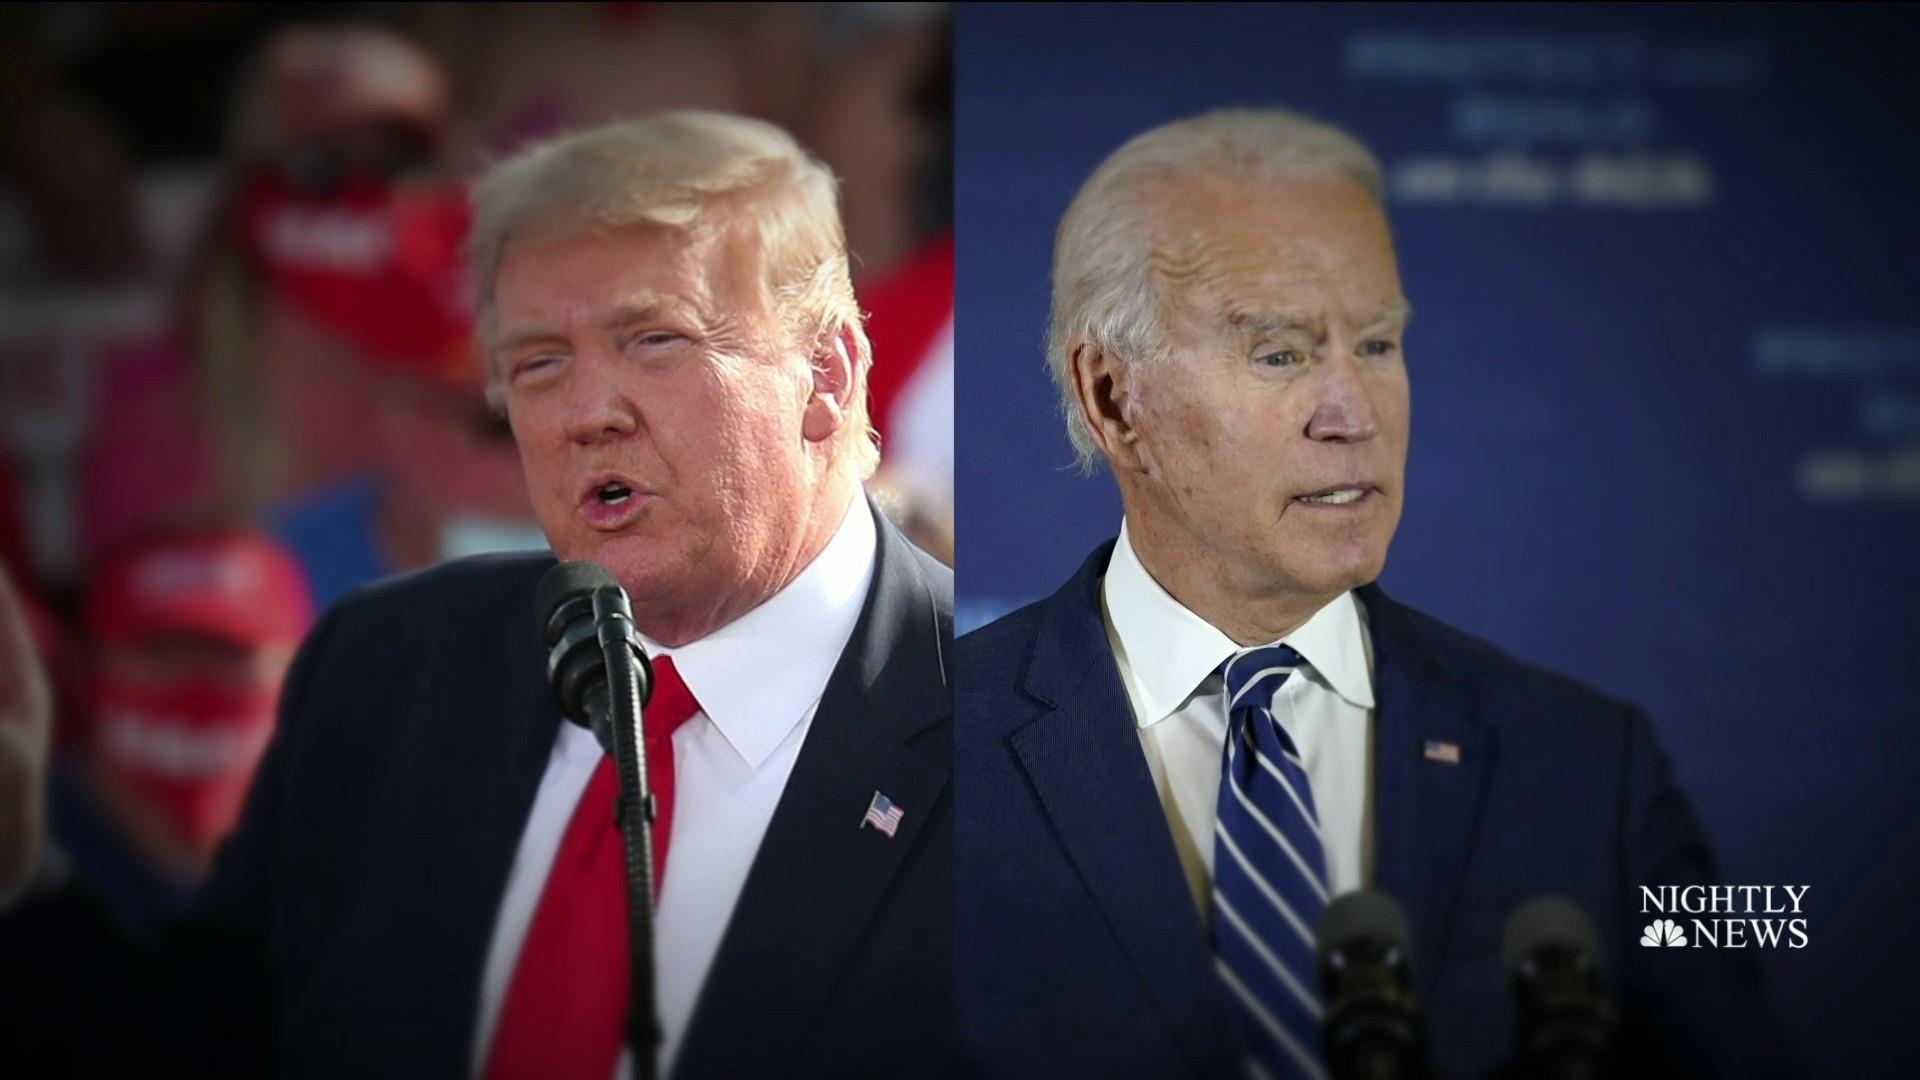 Despite past Democratic wins, Trump making a play for Nevada